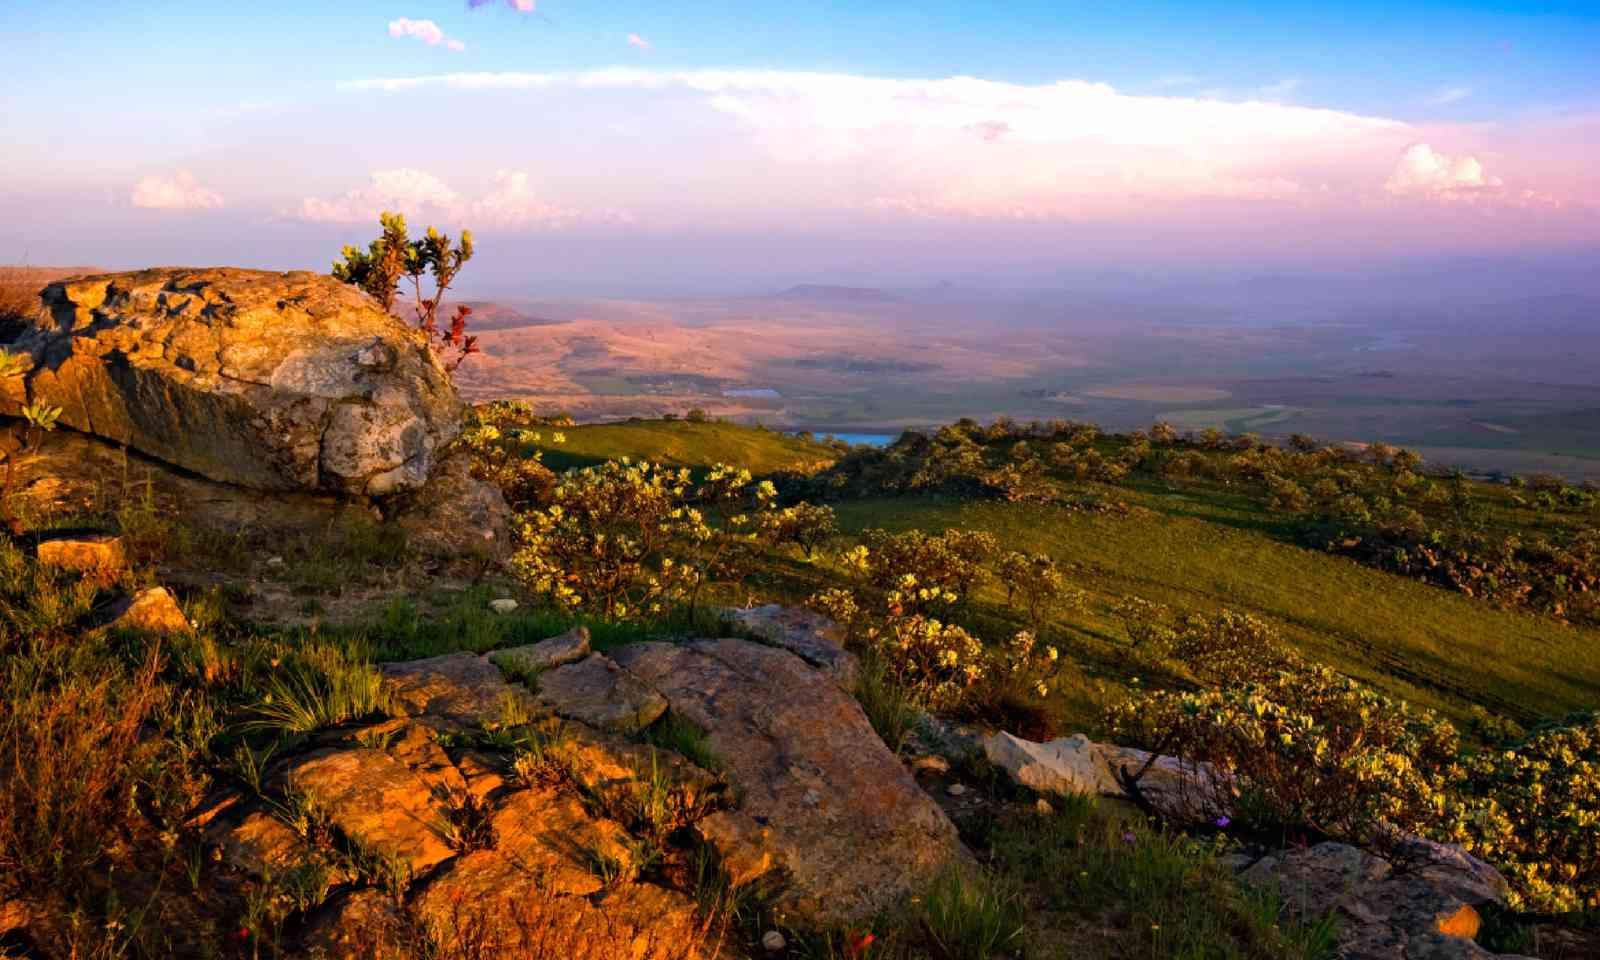 The Drakensberg Mountains, South Africa (Shutterstock)